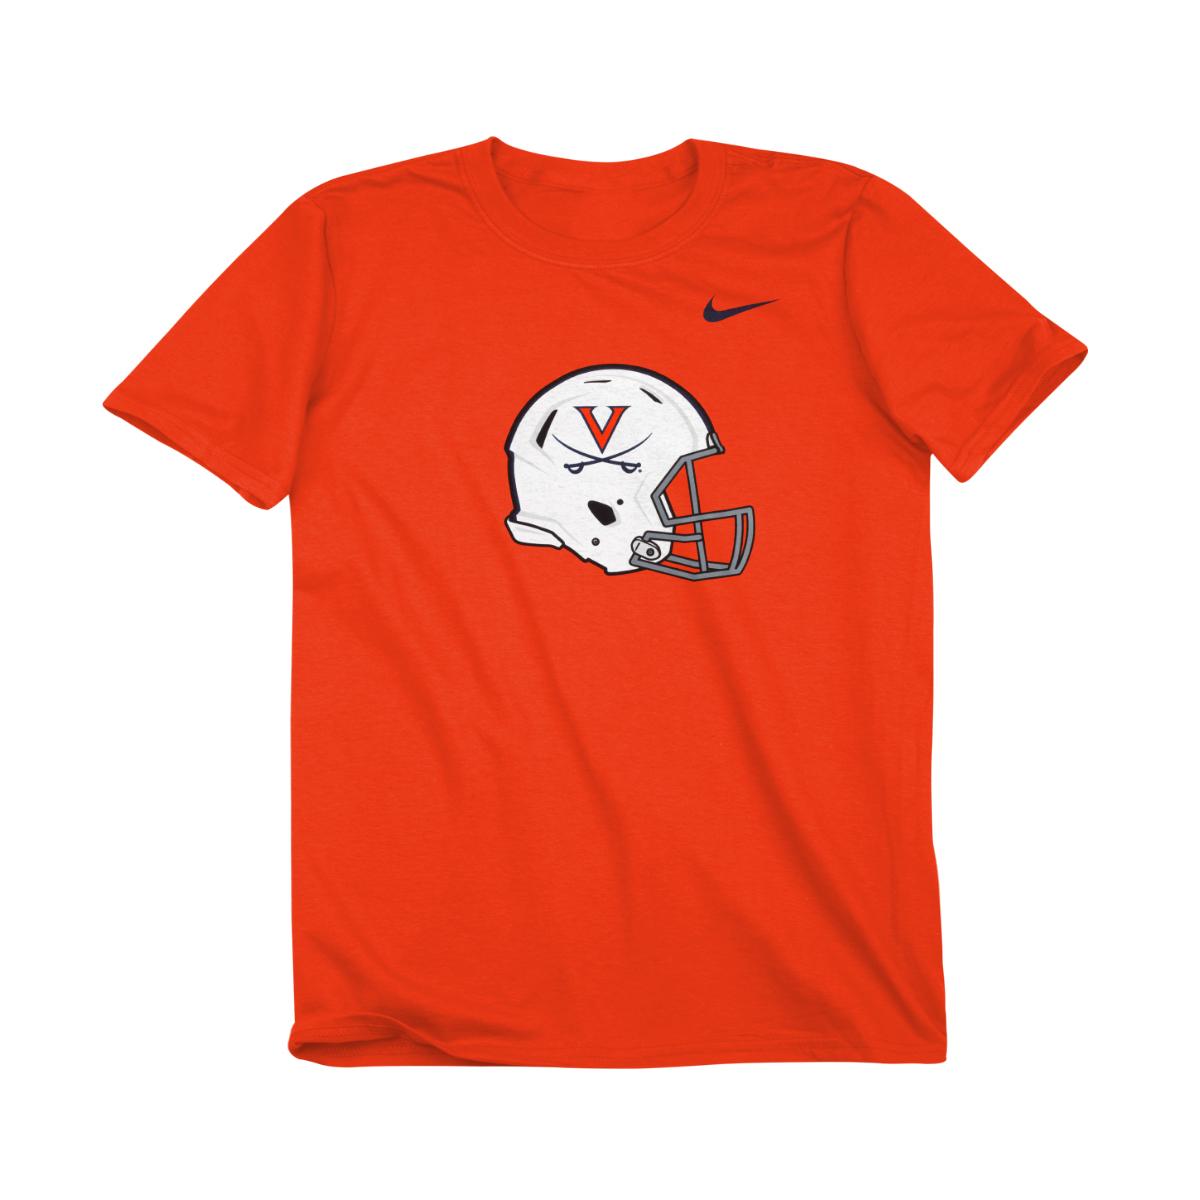 University of Virginia Football Helmet Youth T-shirt